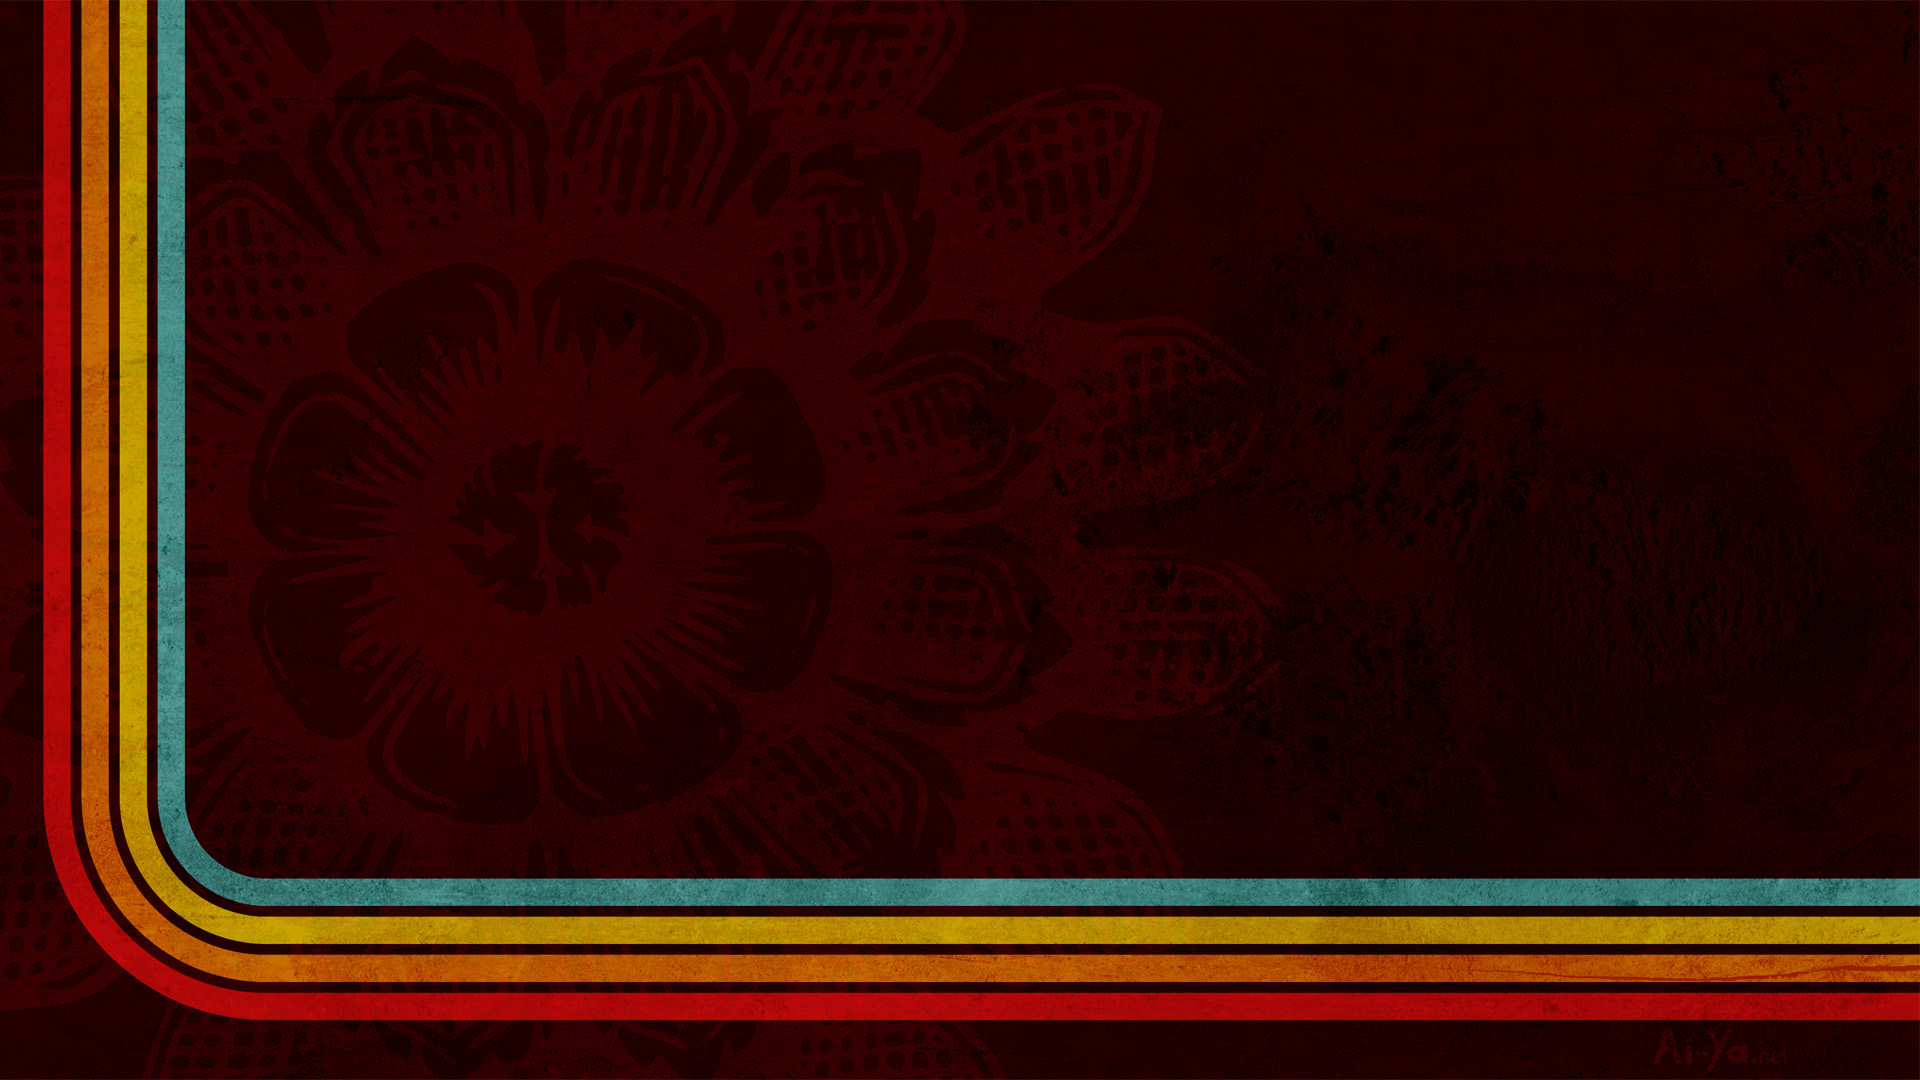 Best 52 Throwback Wallpaper on HipWallpaper Throwback Thursday 1920x1080